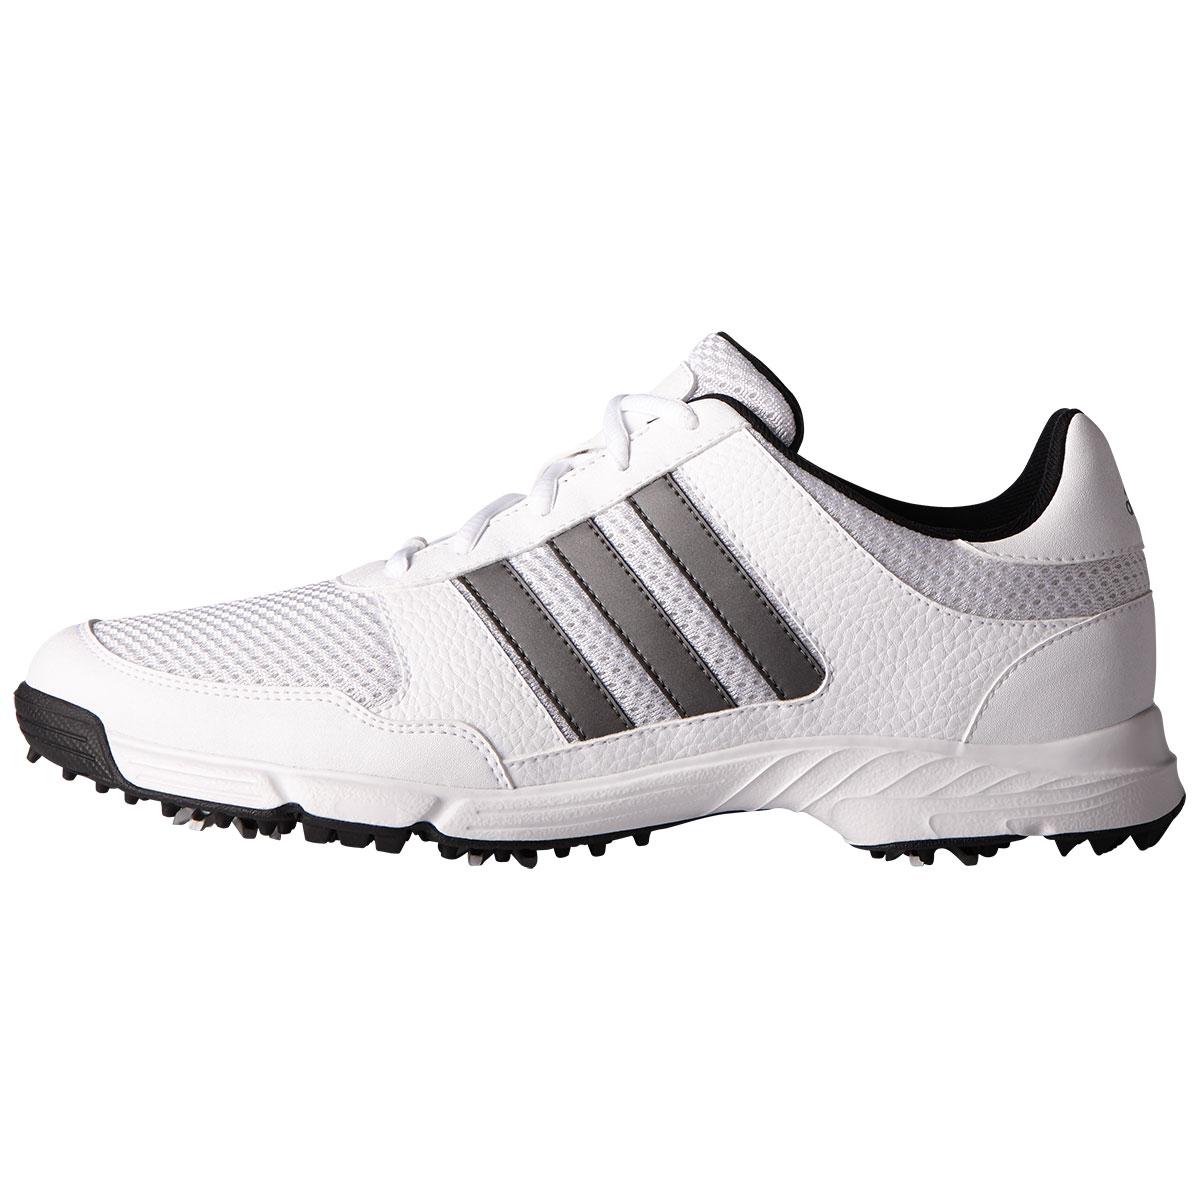 Adidas Men's 2019 Tech Response White/Grey Golf Shoe